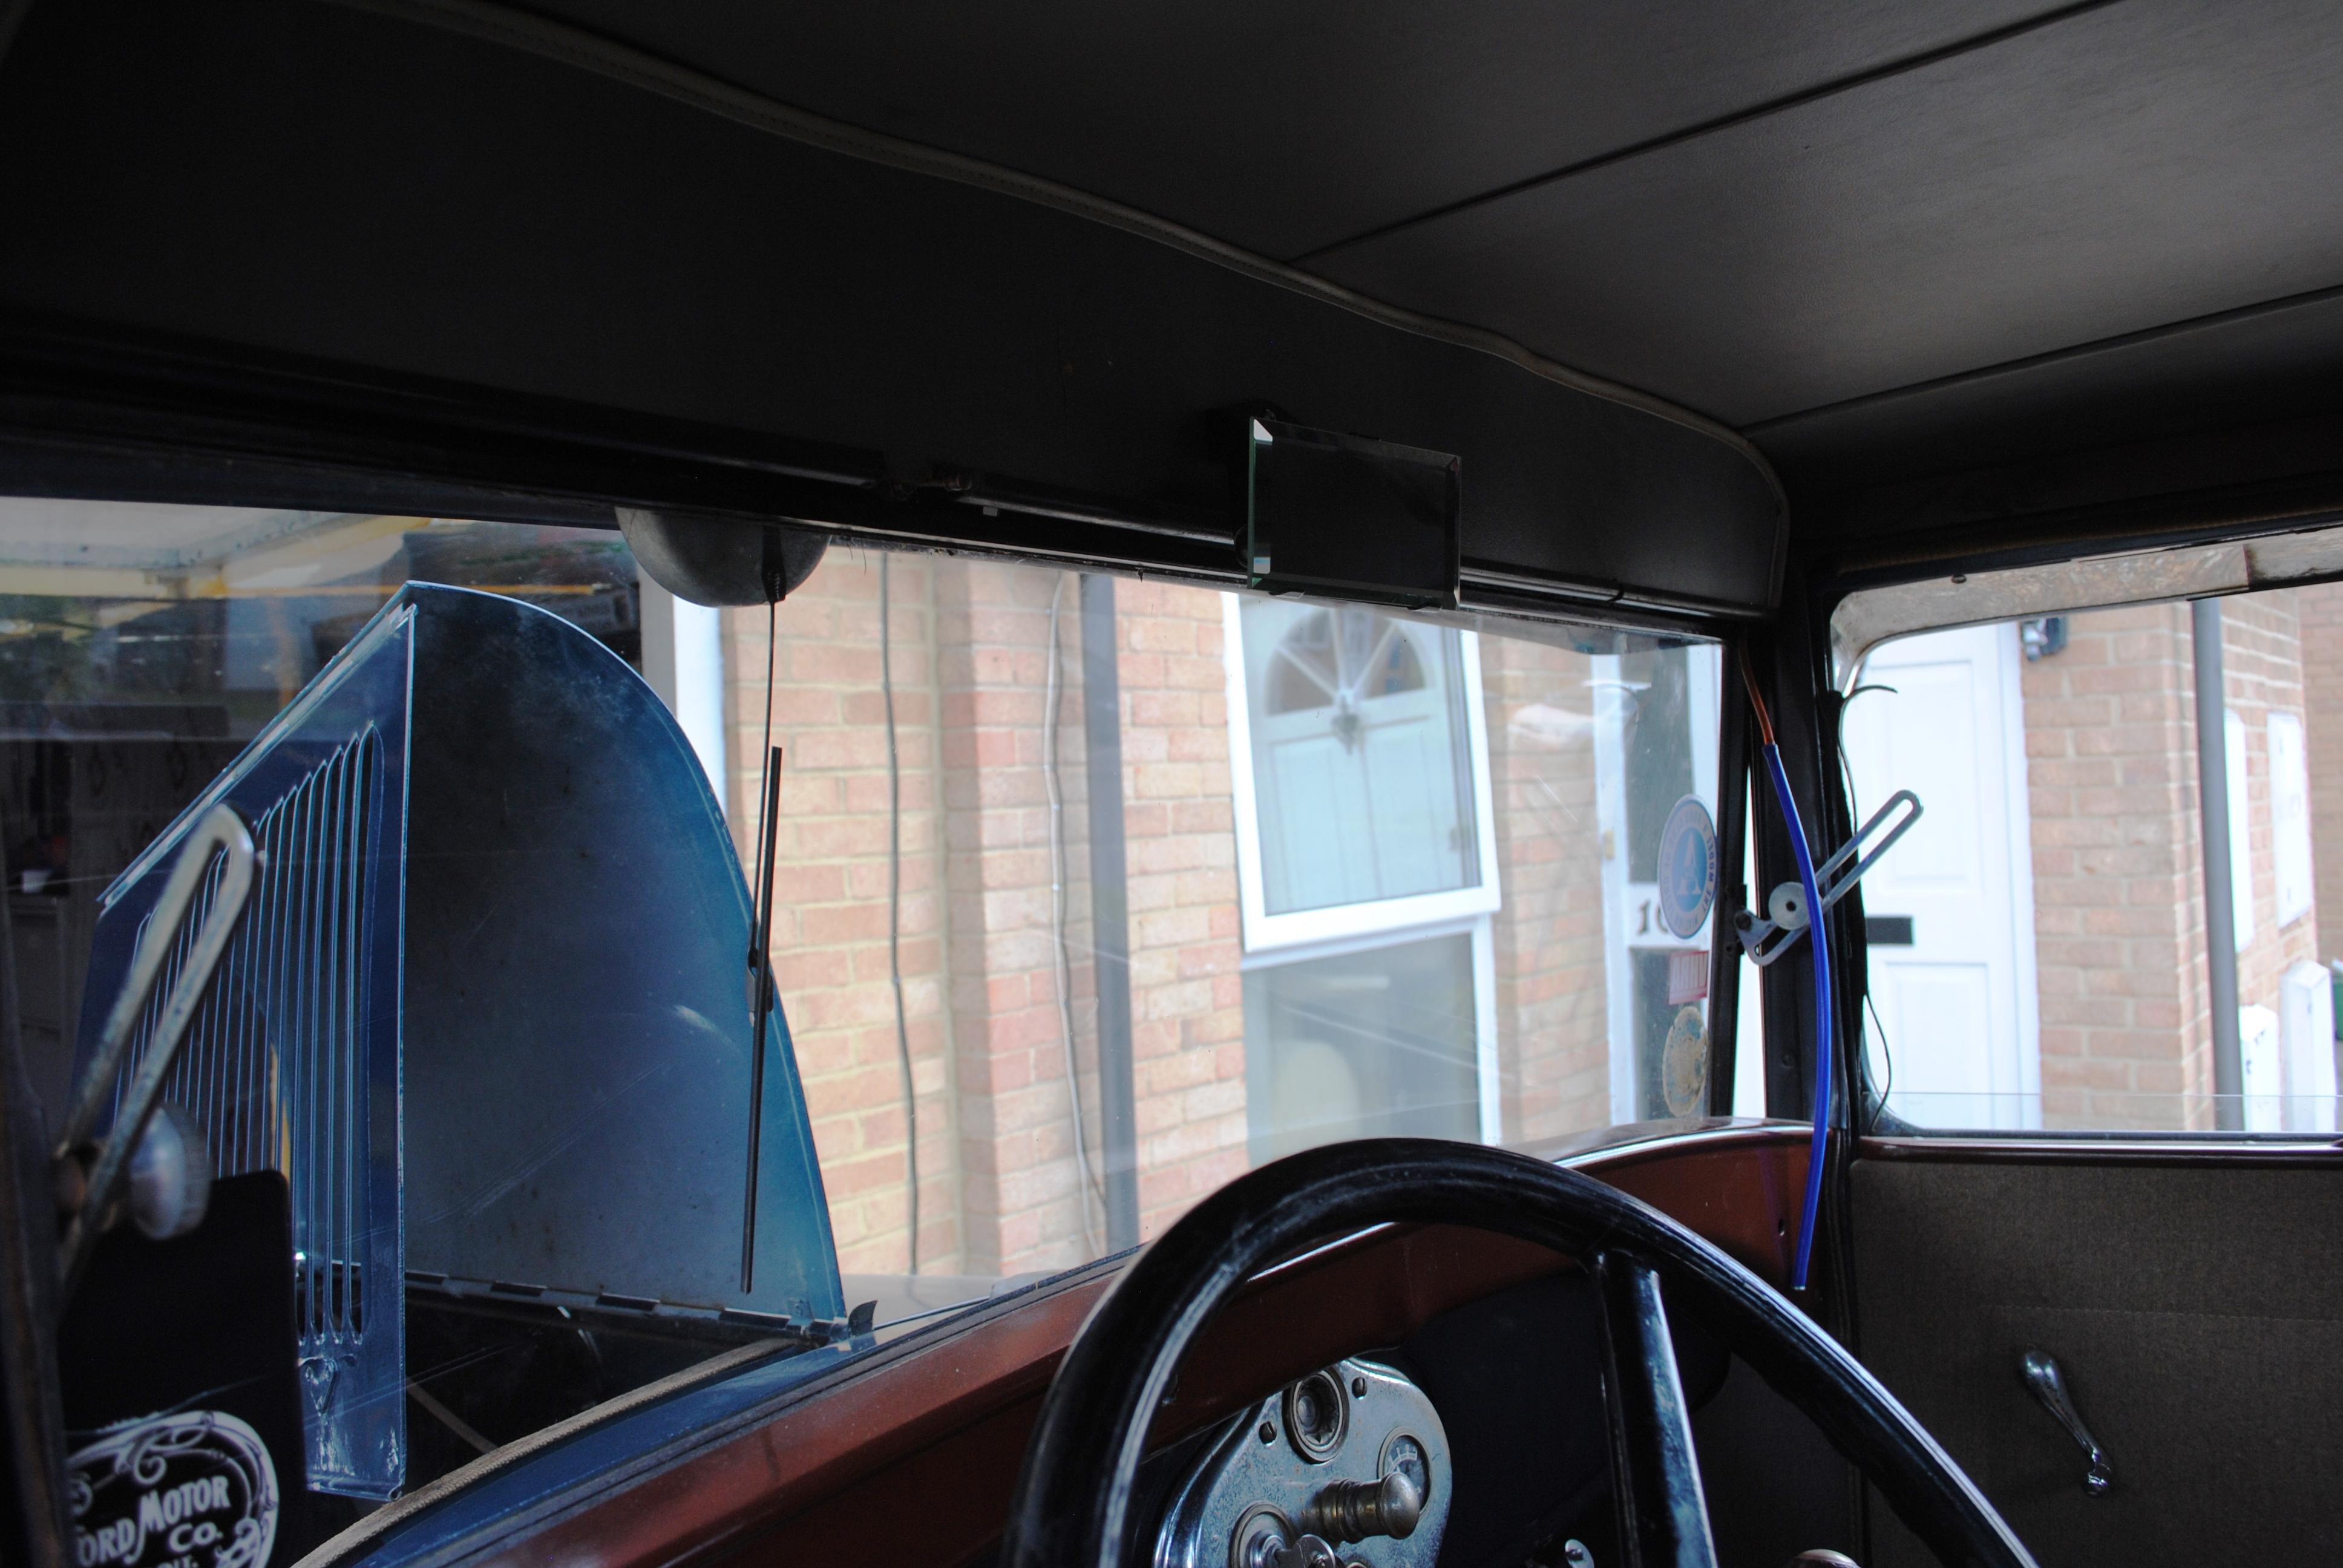 Rear view mirror and header trim